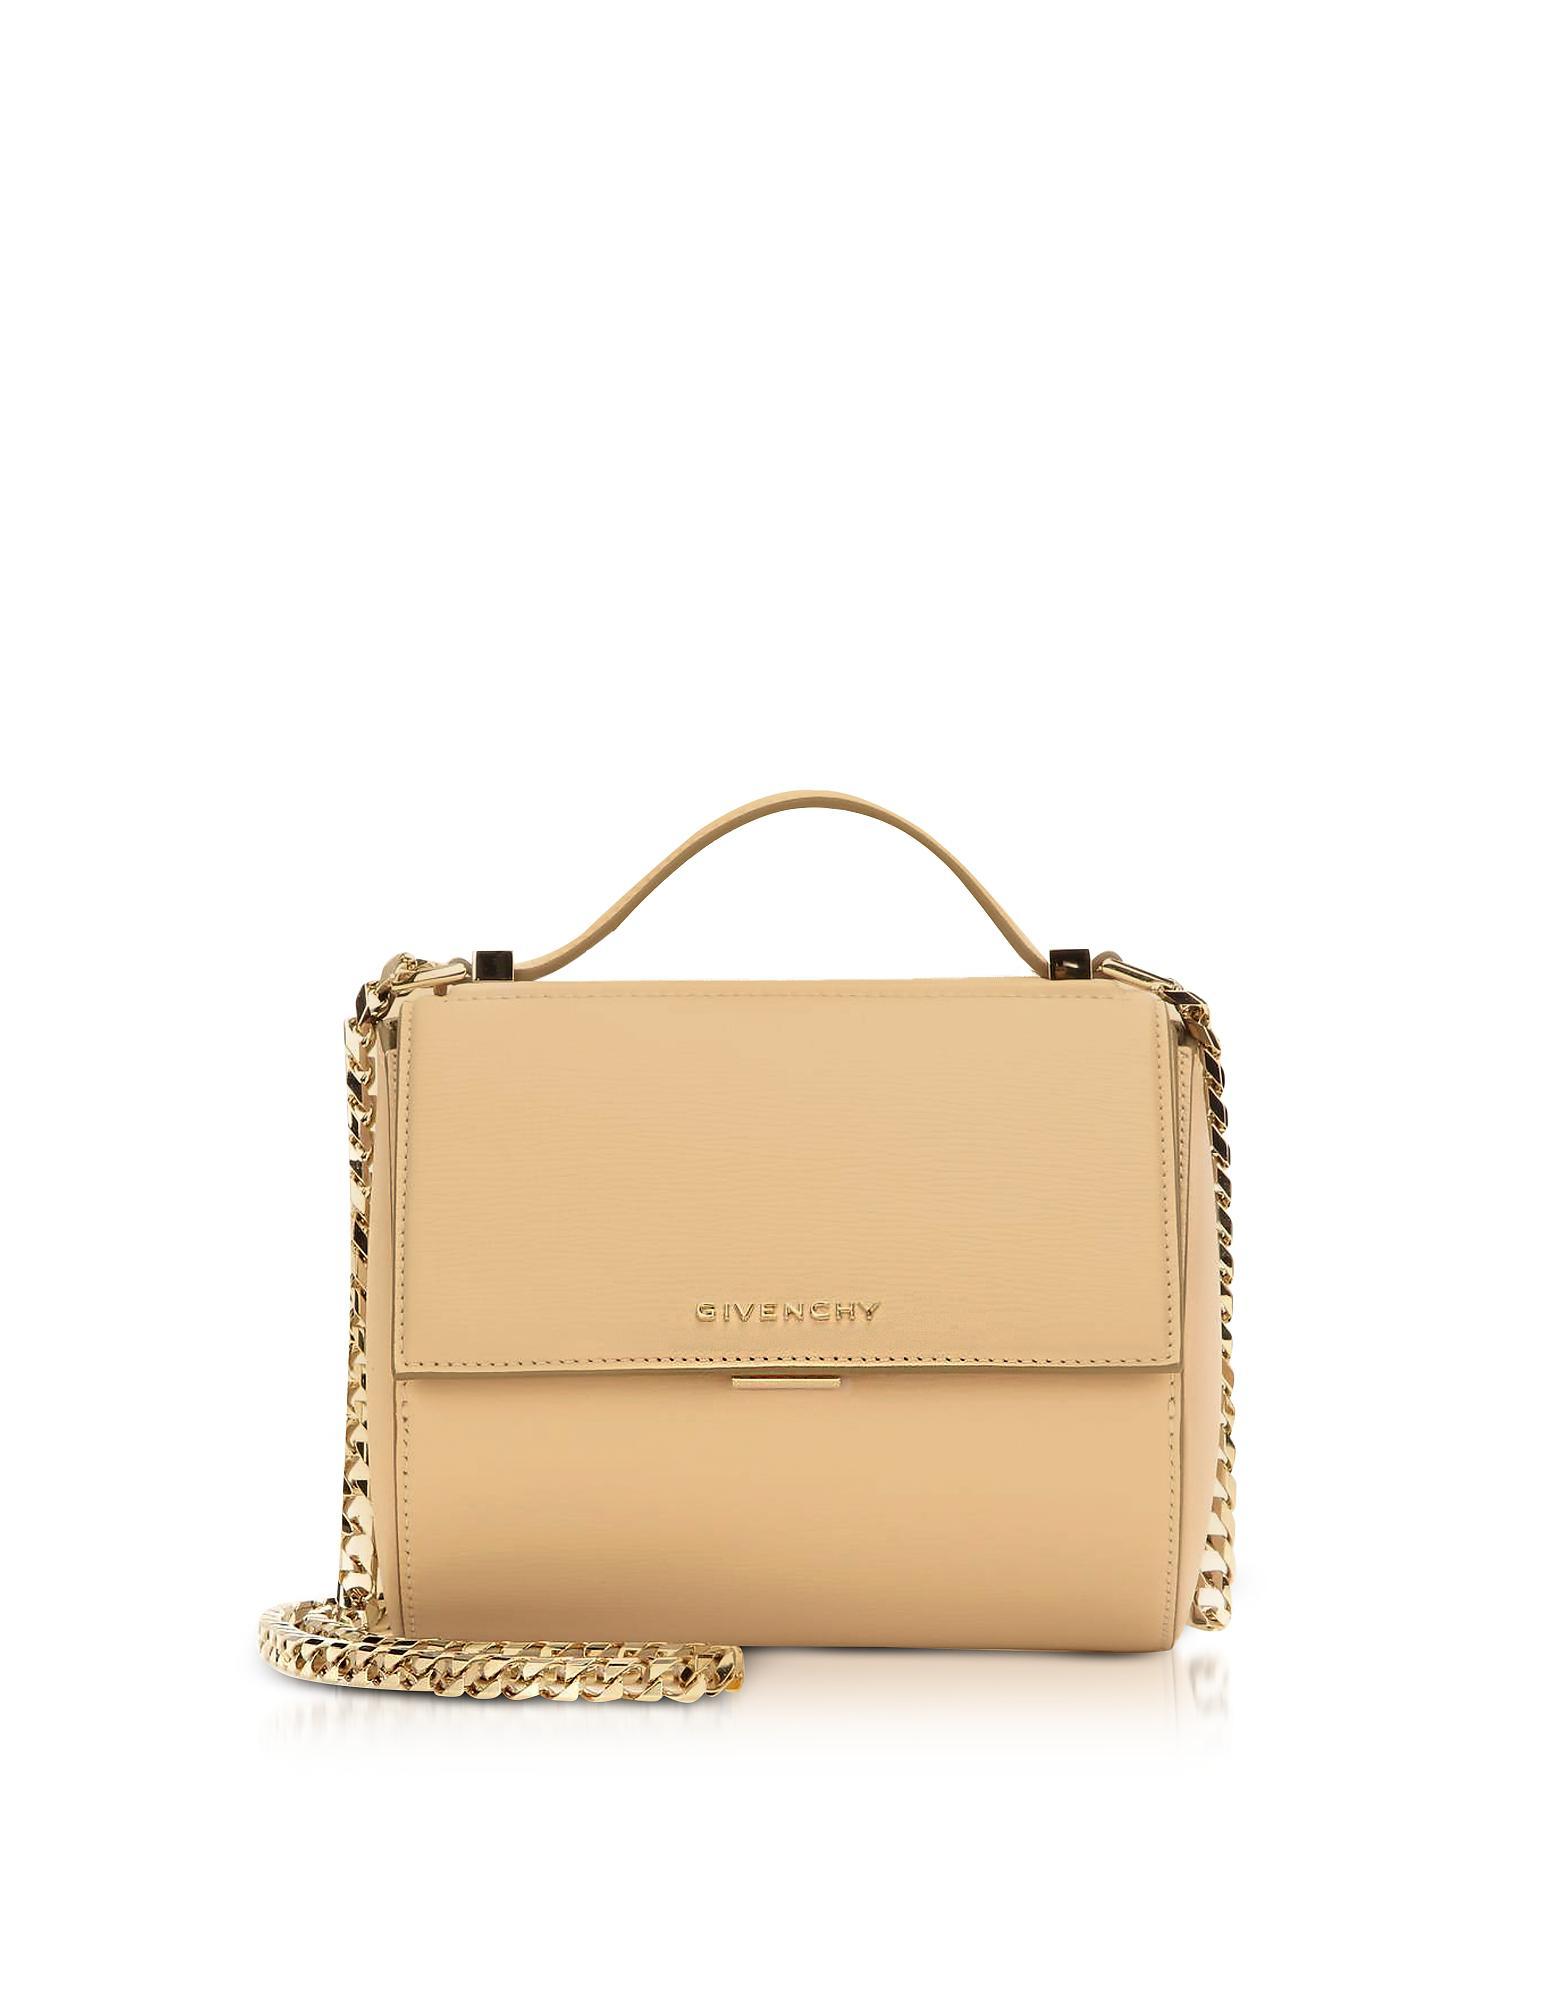 Lyst - Givenchy Light Beige Pandora Box Crossbody Bag in Natural 52a5d2c7eabc9